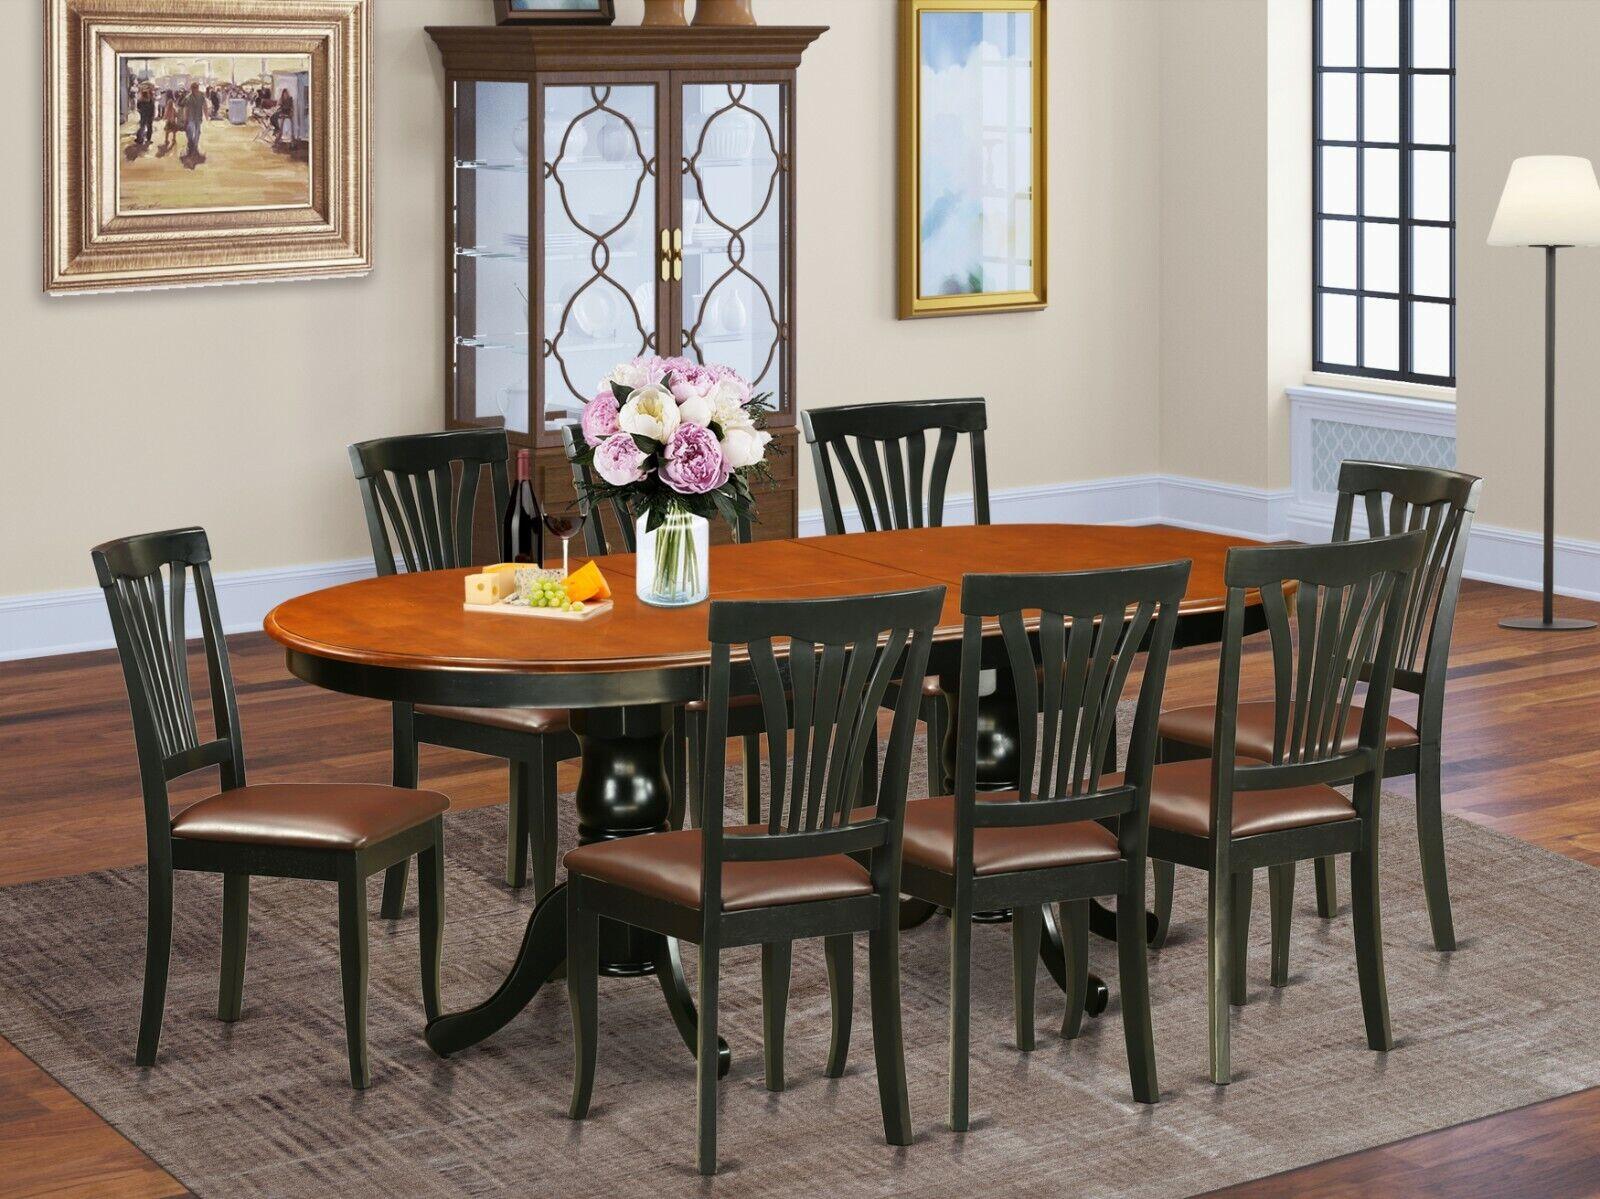 Dining Table Set For 8 Farmhouse Room Elegant Fine Windsor Chairs 9pc Black Oak For Sale Online Ebay